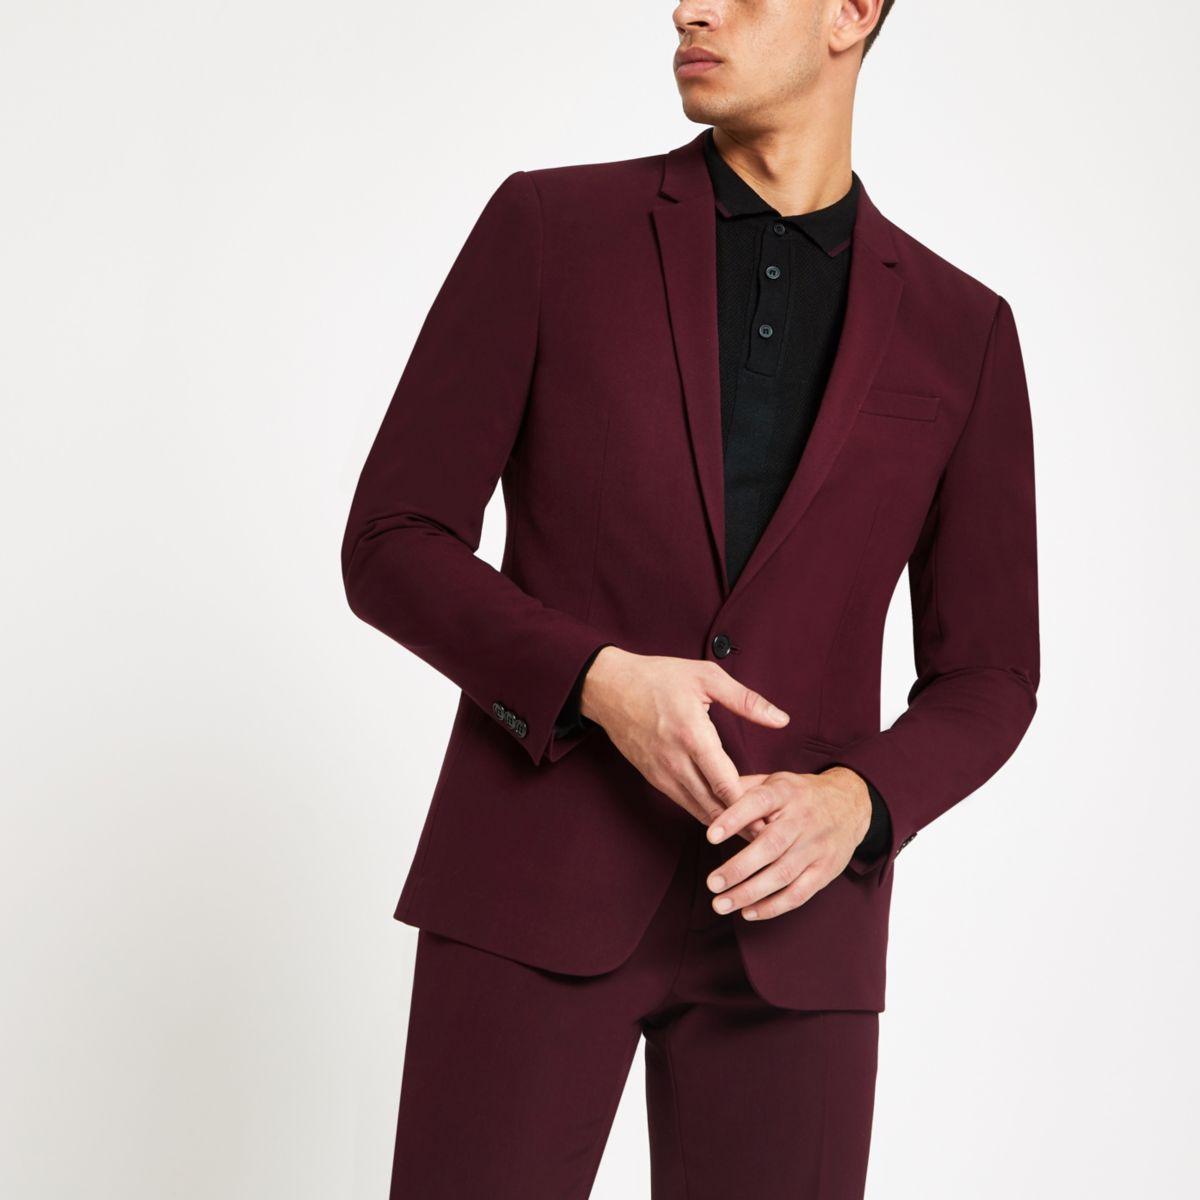 Burgundy skinny fit suit jacket